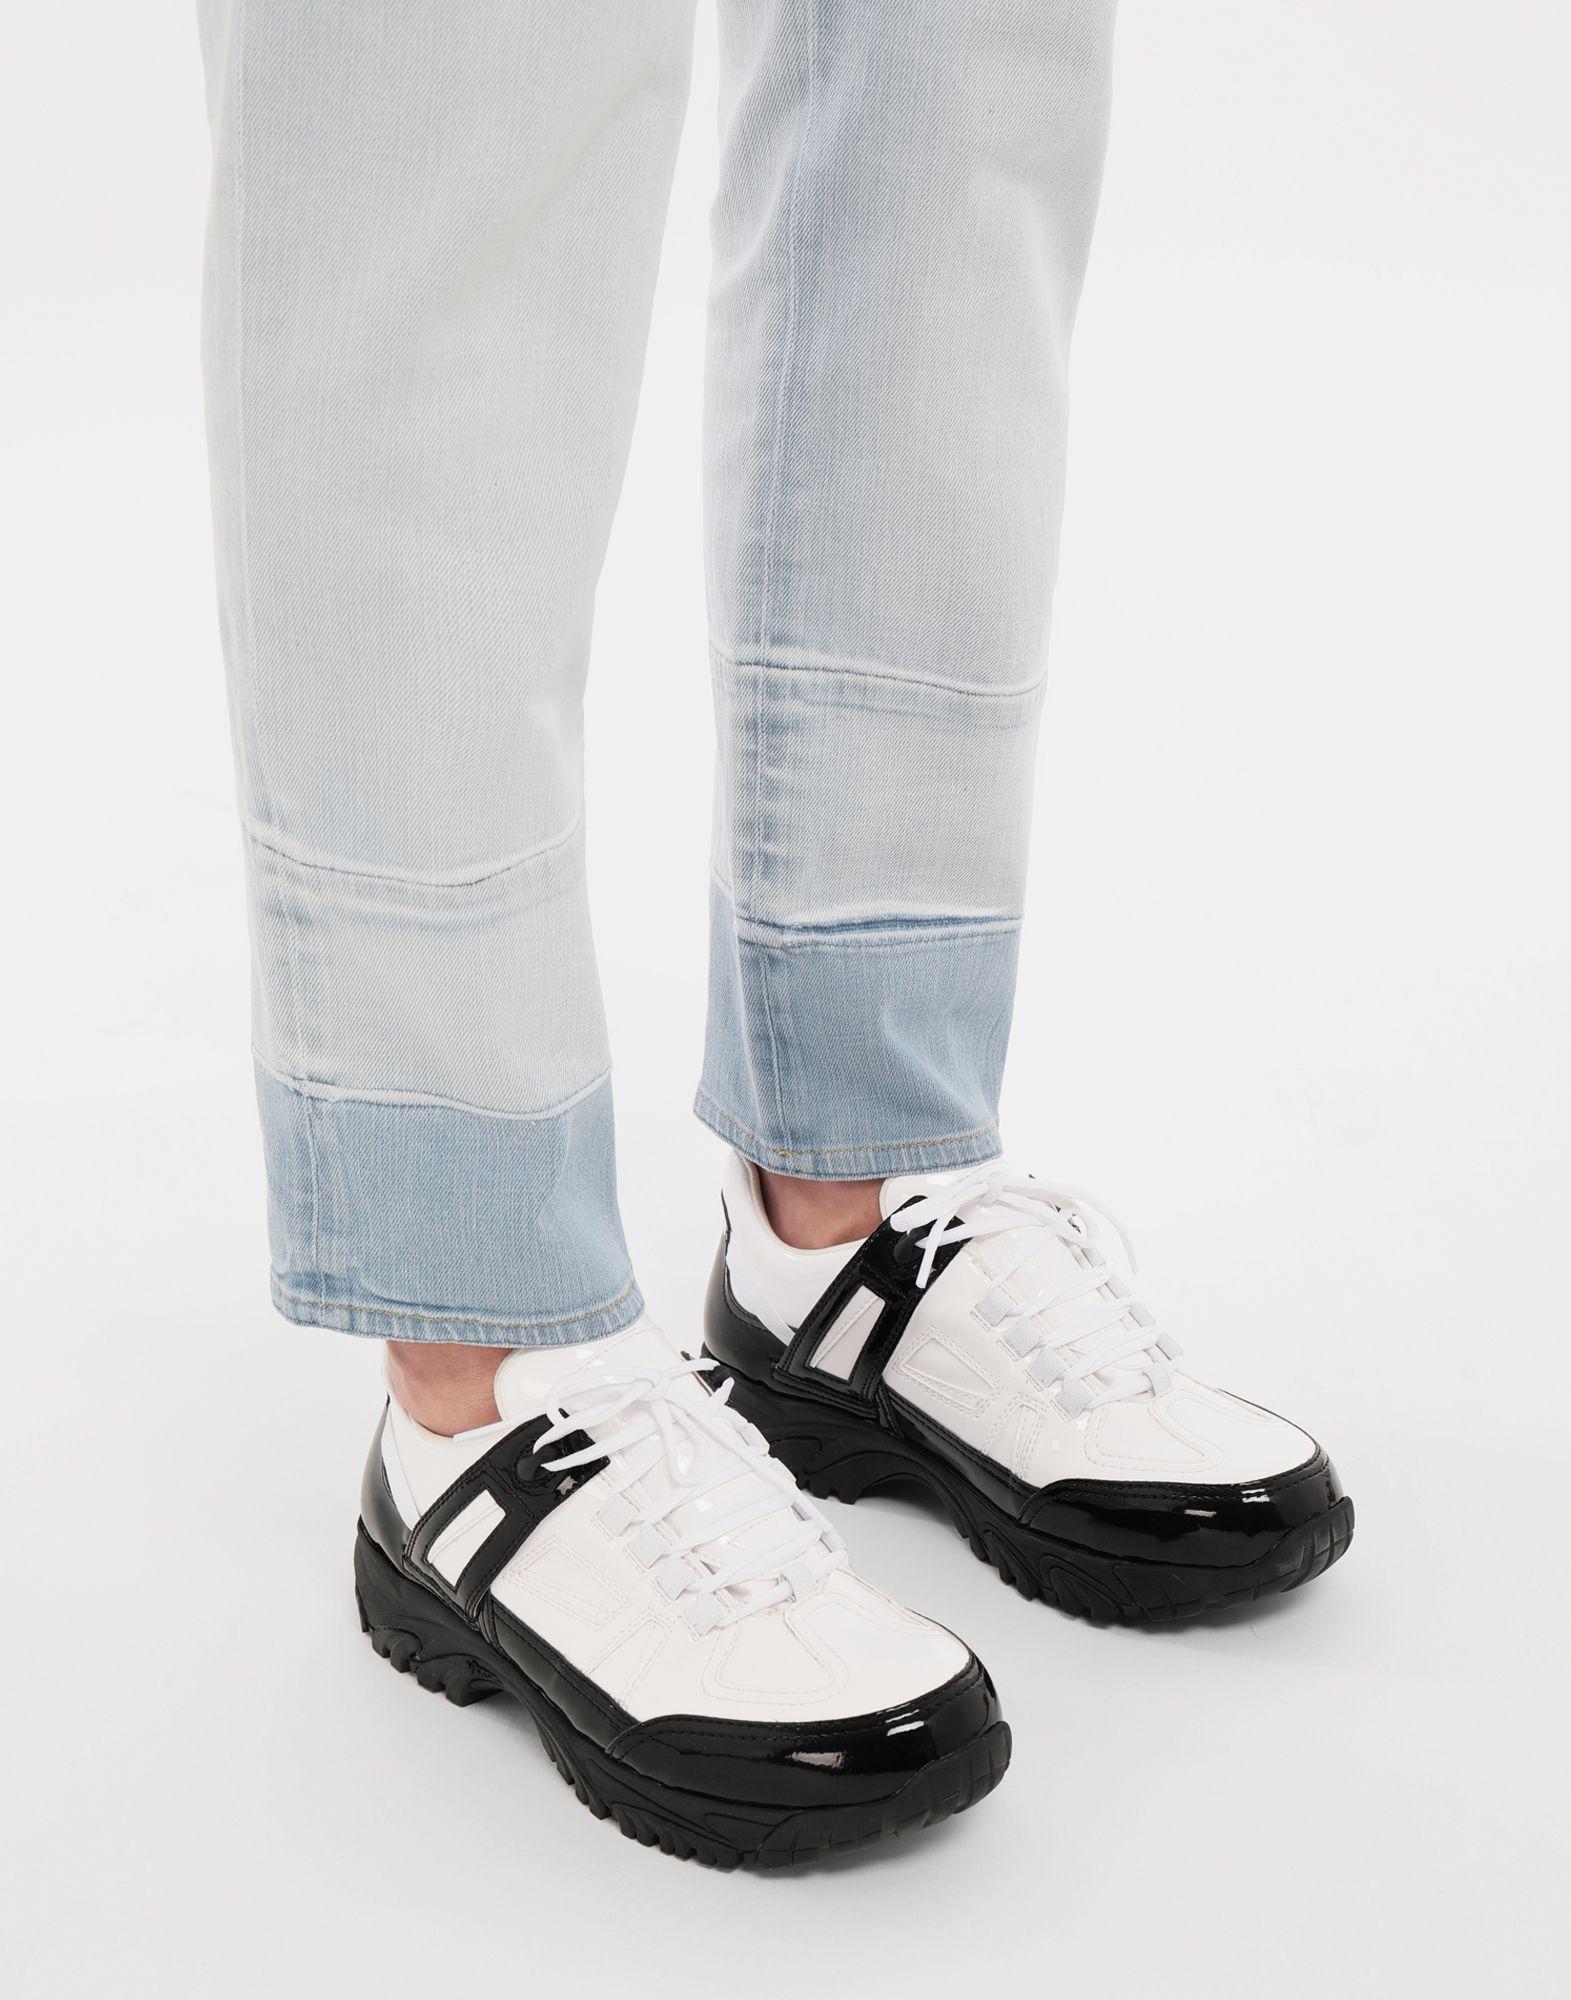 MAISON MARGIELA Sneakers Security aus Lackleder Sneakers Herren b